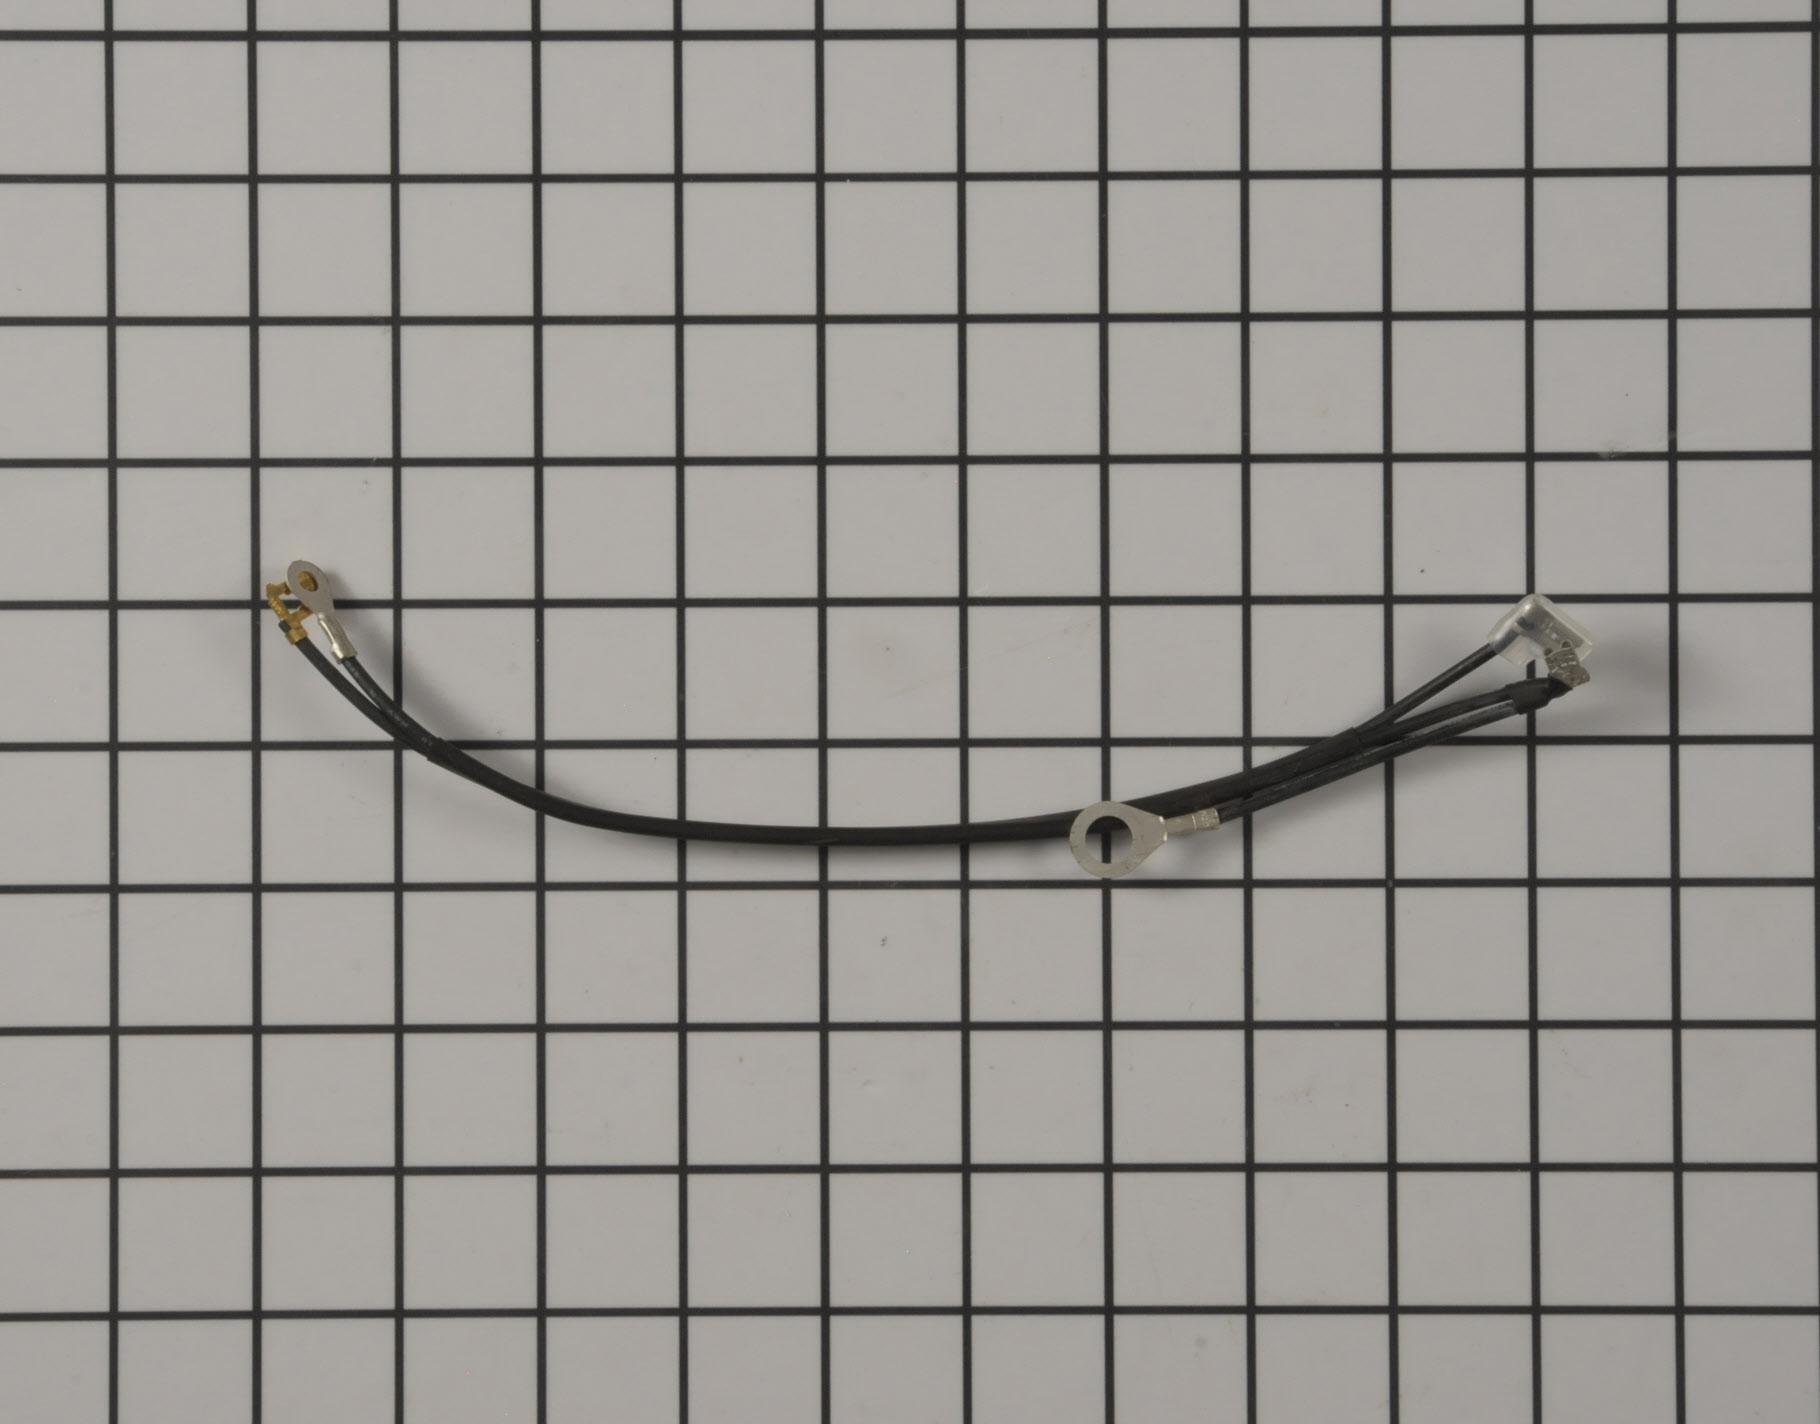 545127601 Poulan Pro Leaf Blower Part -Wire Harness